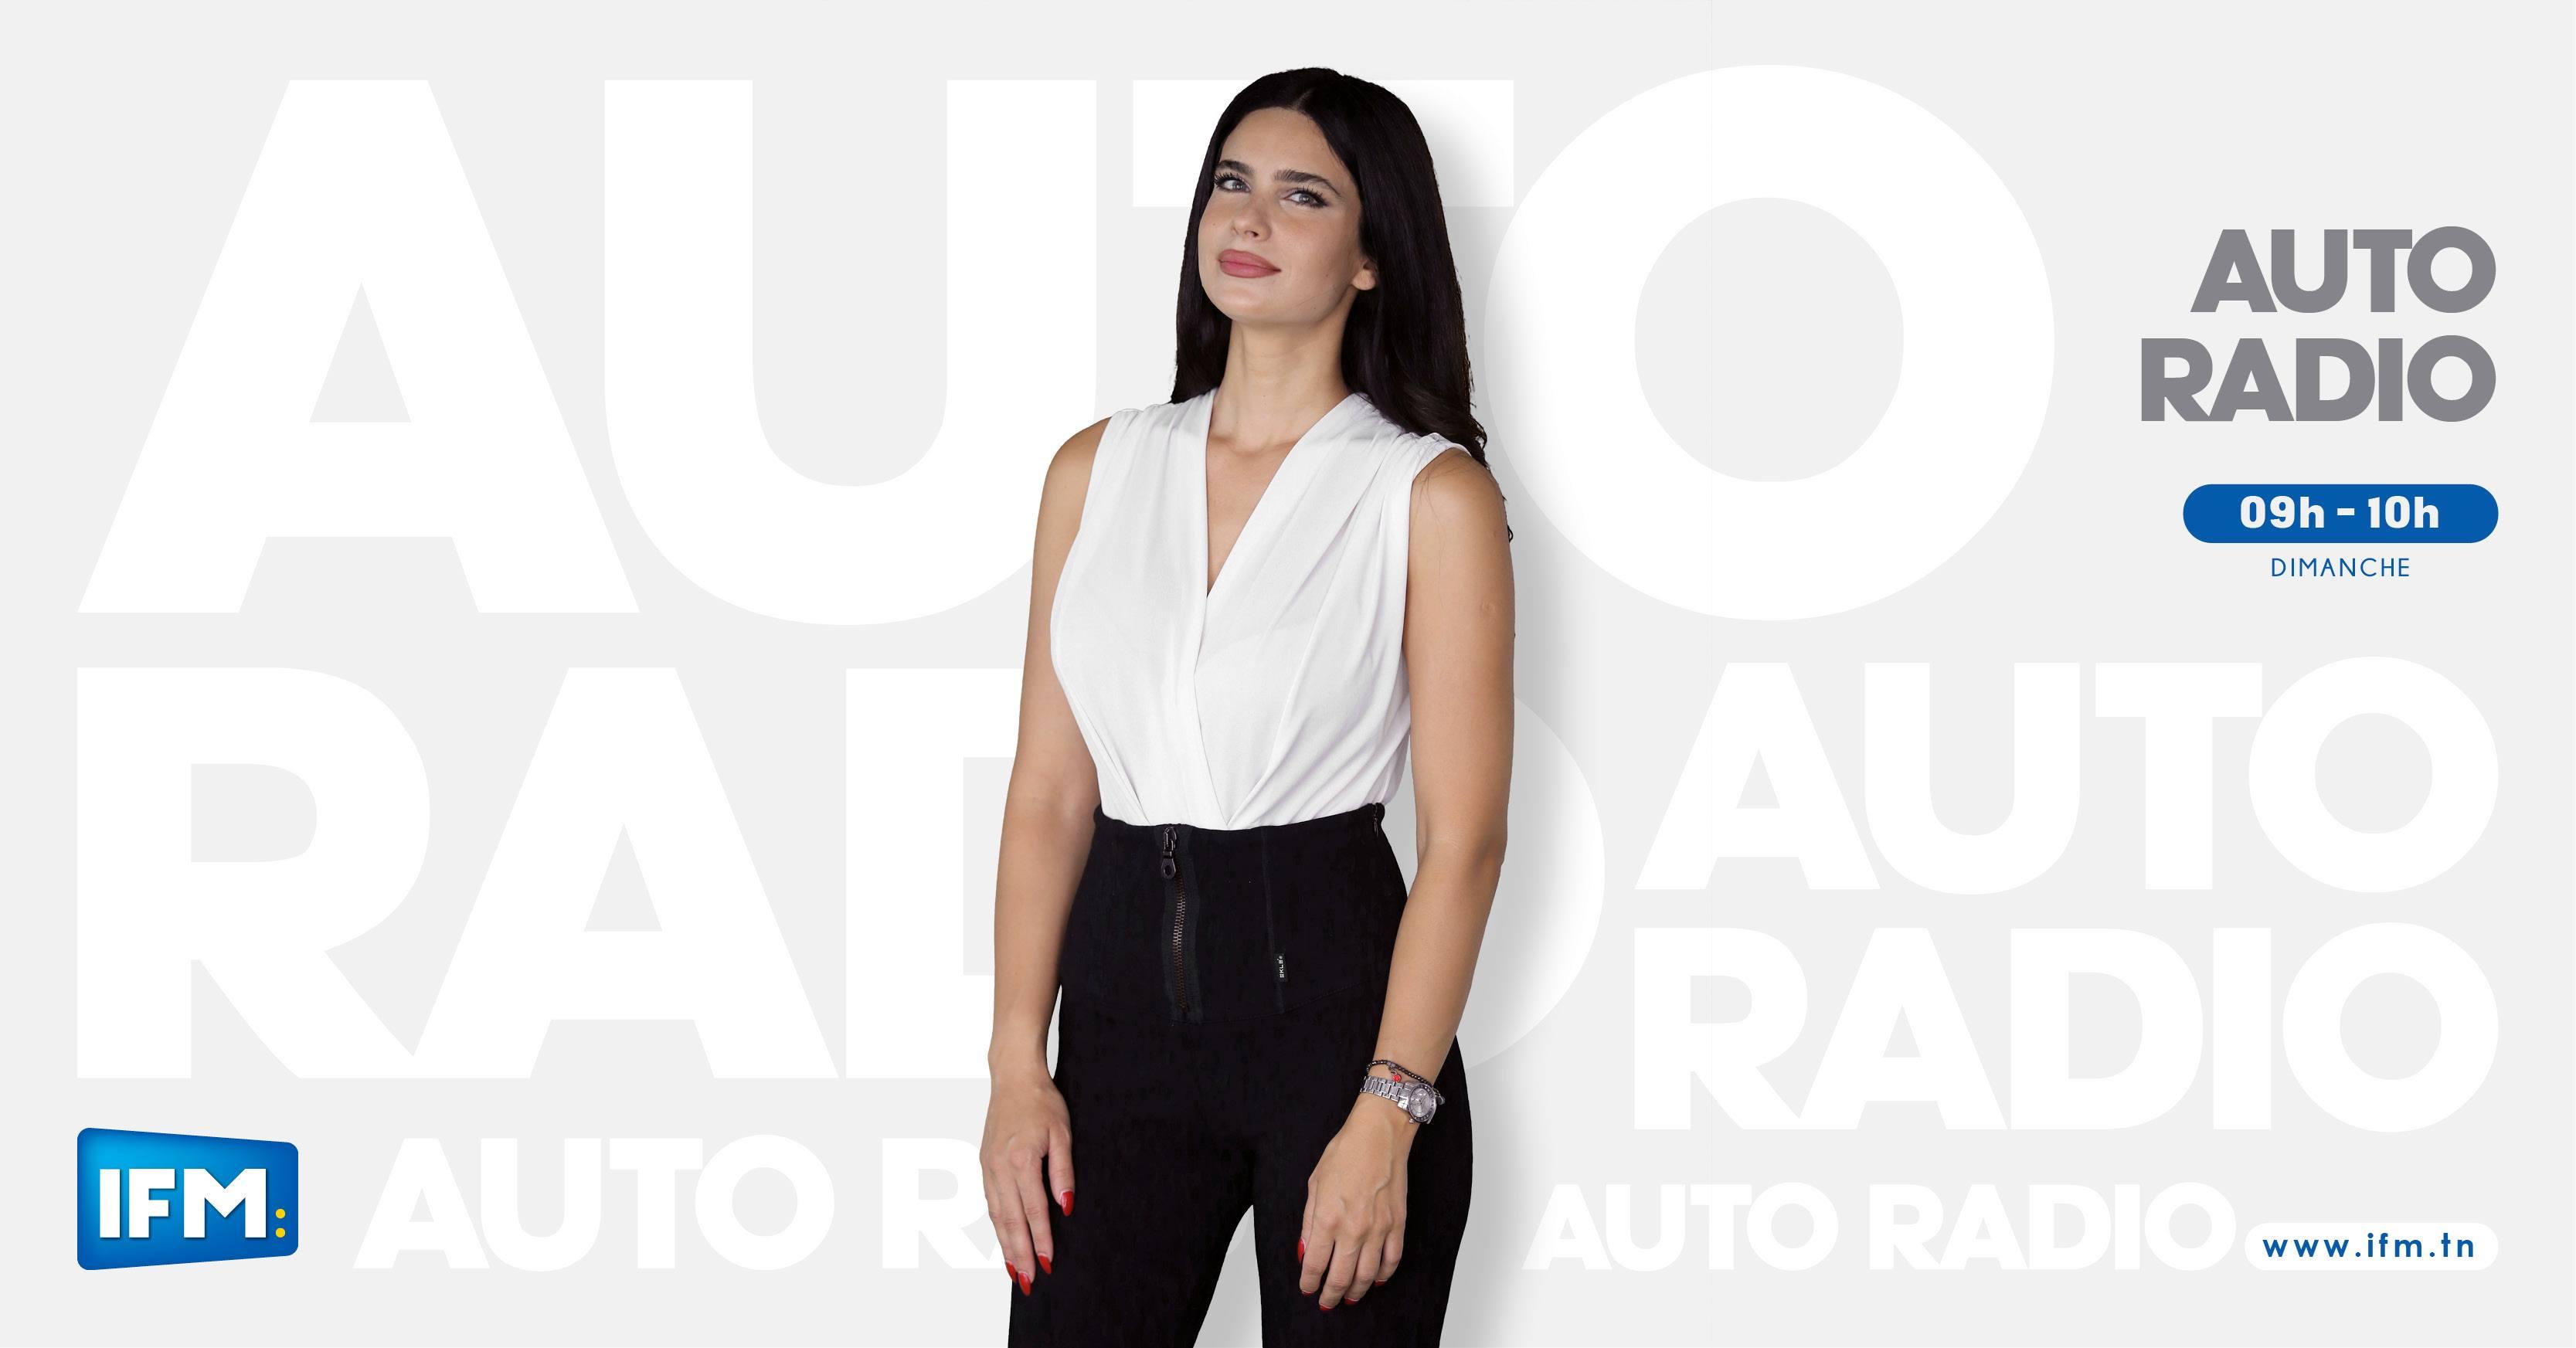 Auto Radio le 17 01 2021